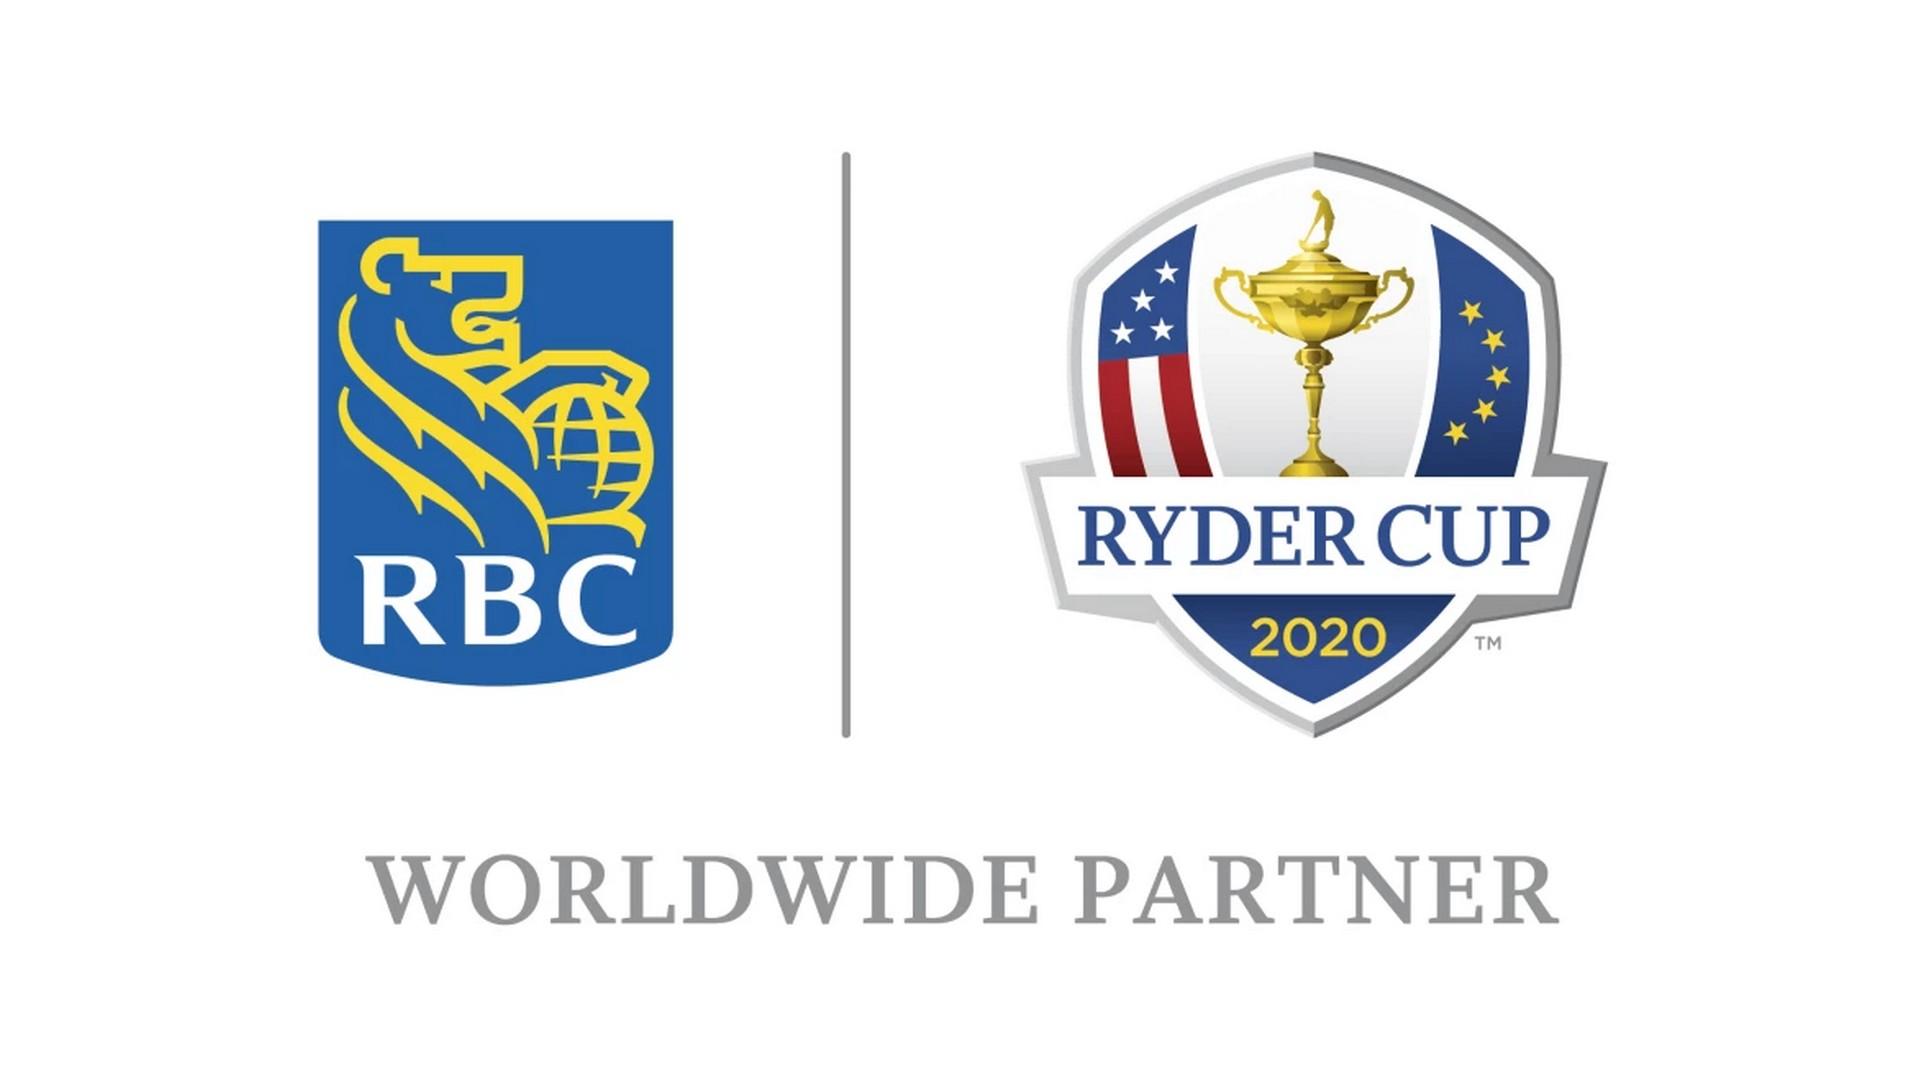 RBC x Ryder Cup (golf) 2021